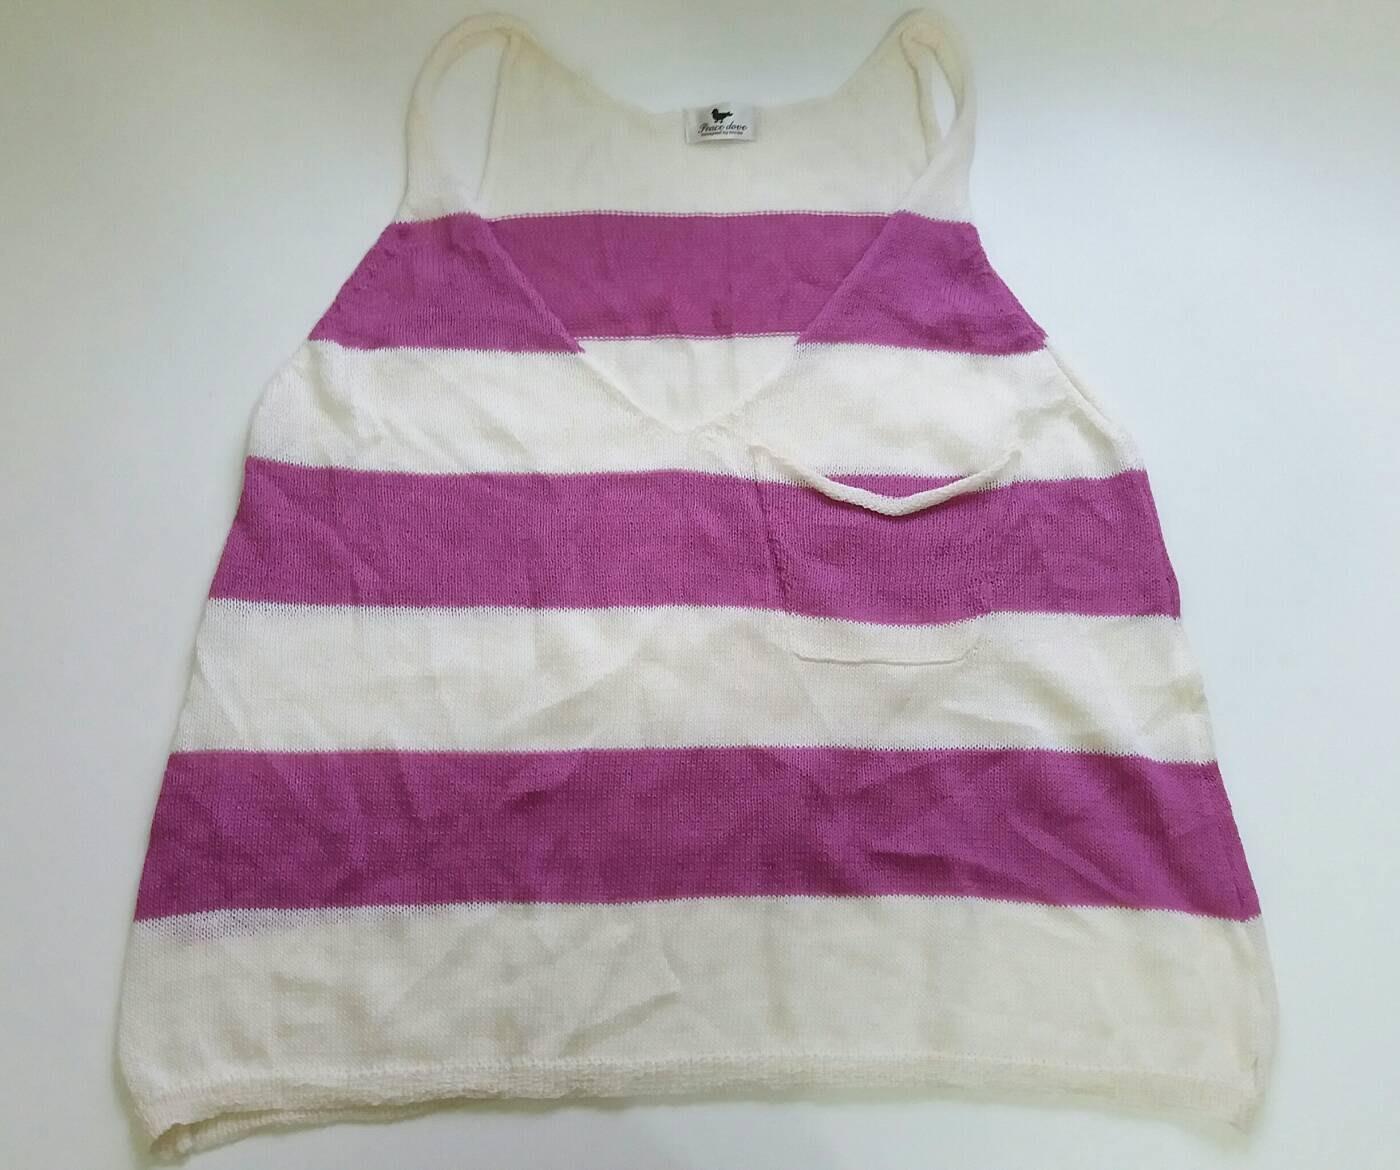 Peace Dove米白色莓紫色橫條紋背心針織衫單口袋設計長版混羊毛衫4 1元起標GUESS iCB ef-de 參考